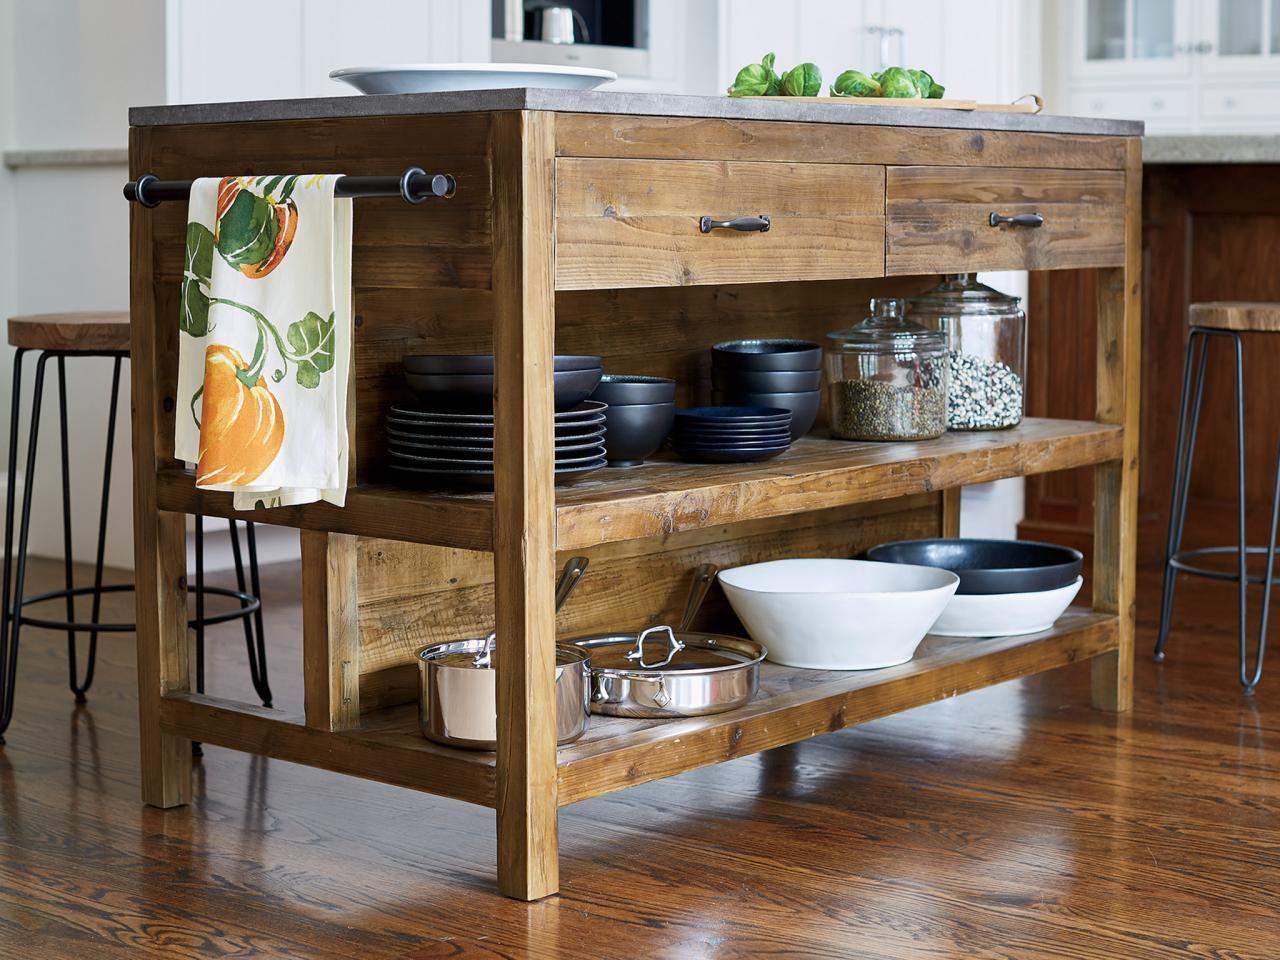 Browse photos of creative kitchen island designs at hgtv